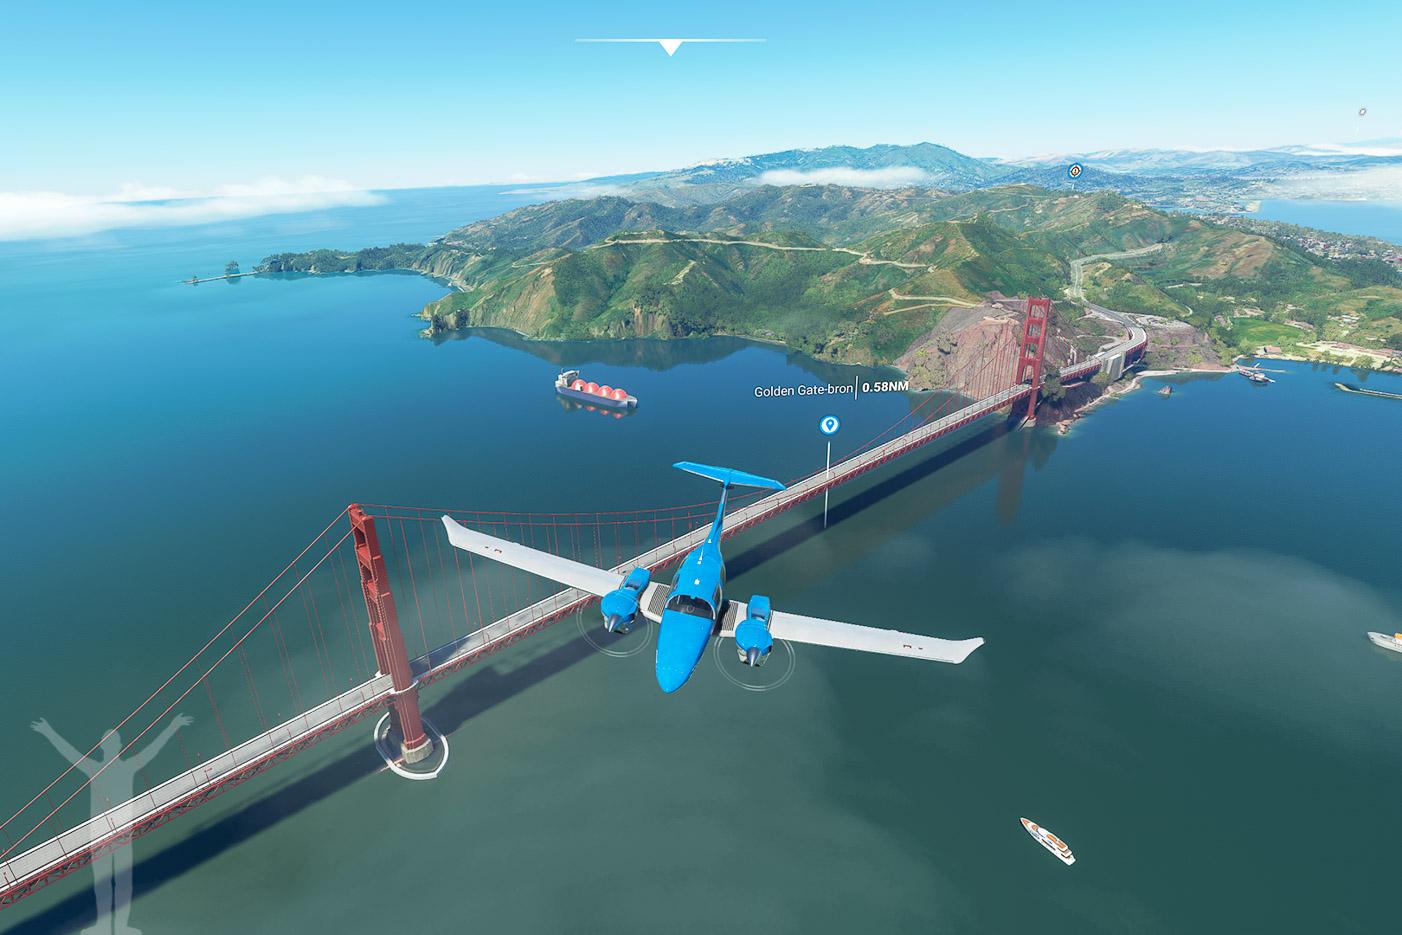 Golden Gate-bron i SFO